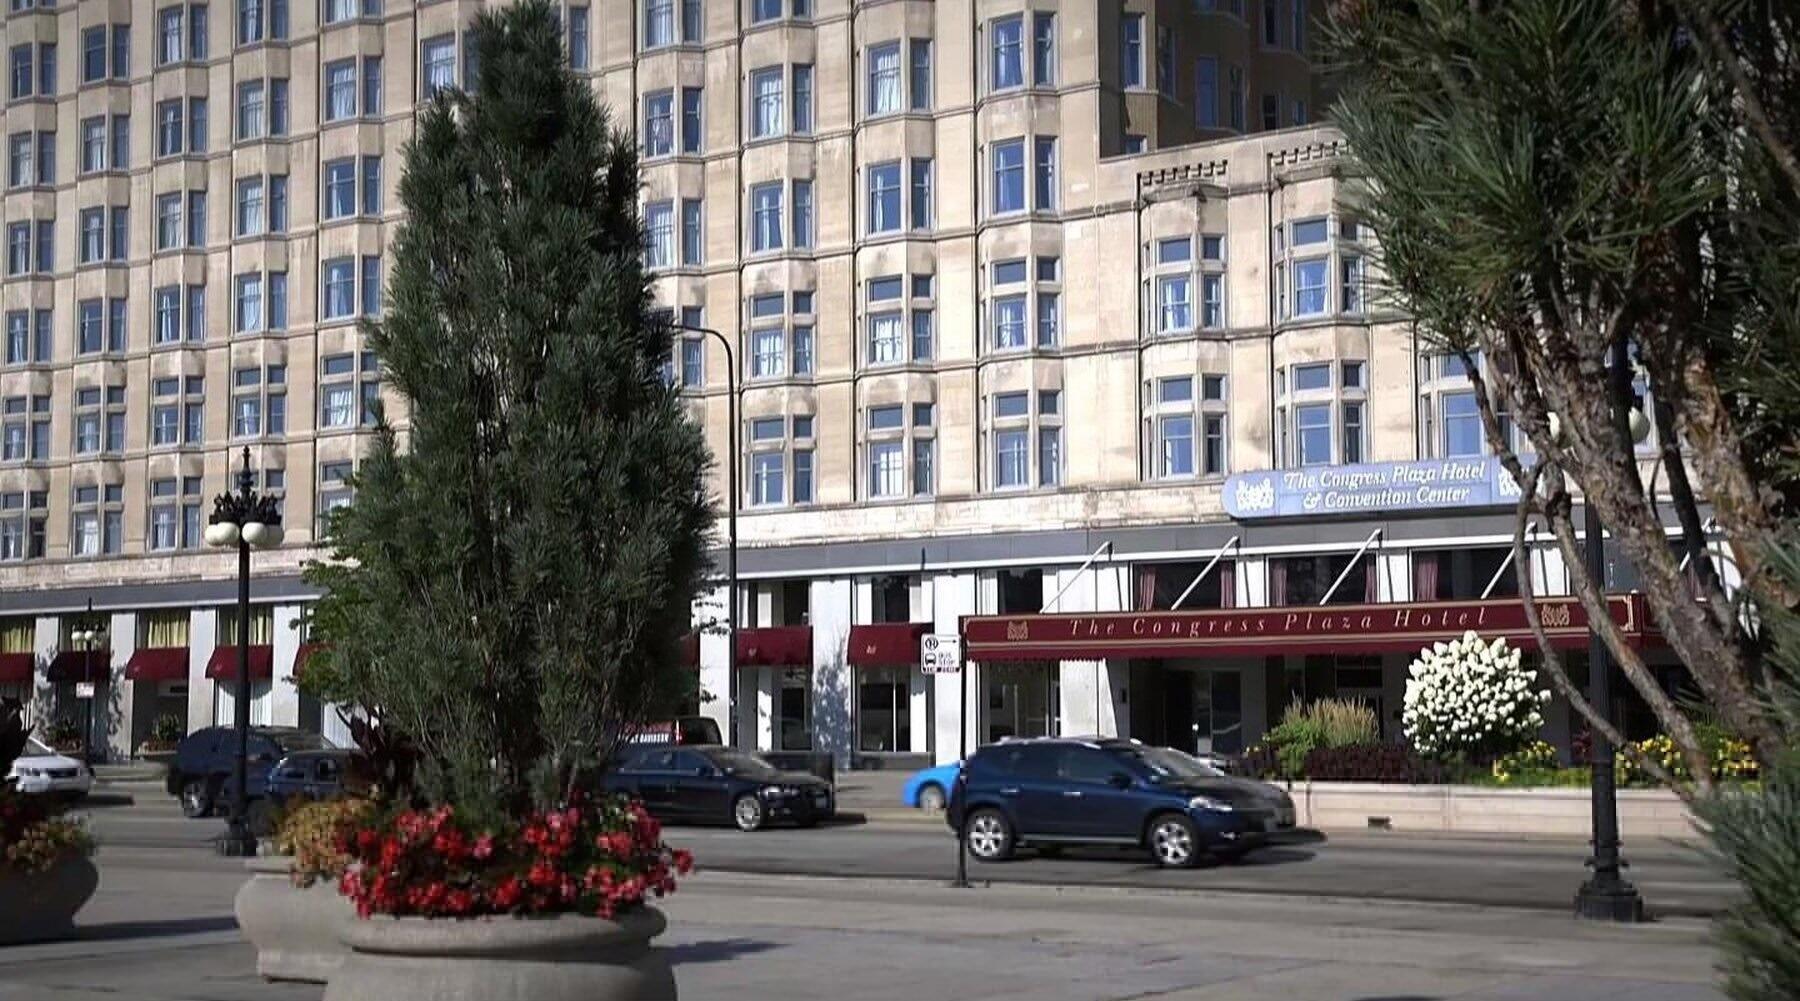 Congress Plaza Hotel Entrance